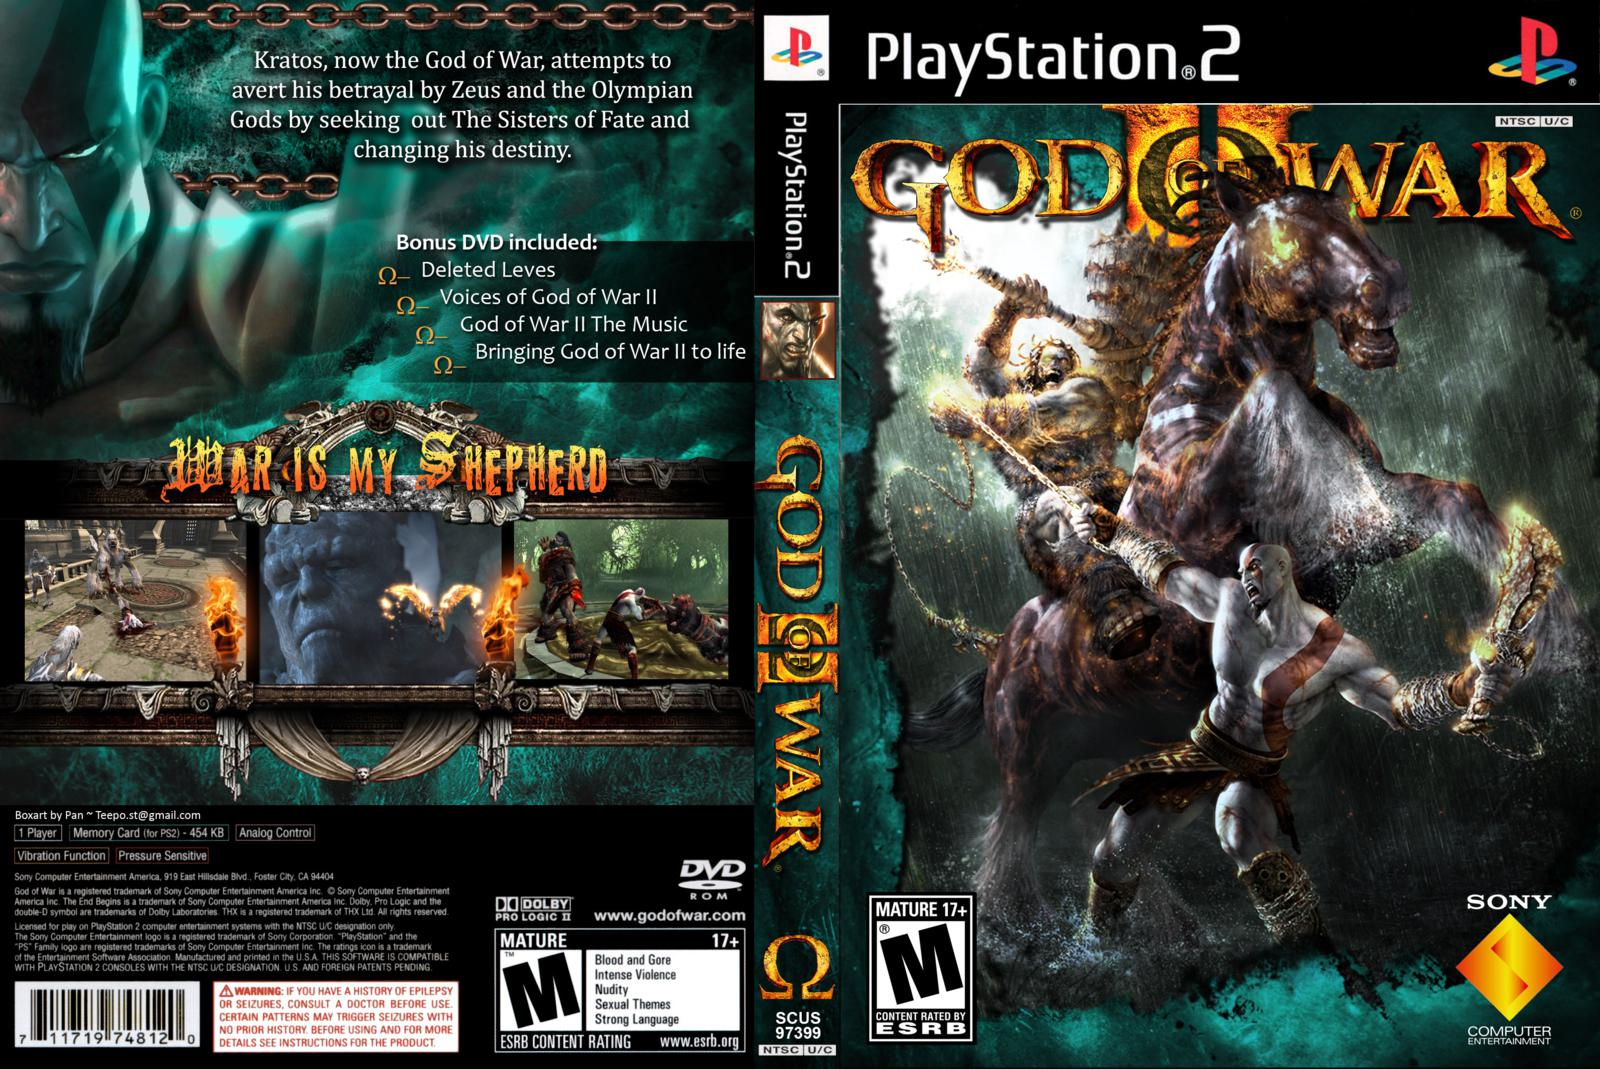 God of war 2 ps2 game